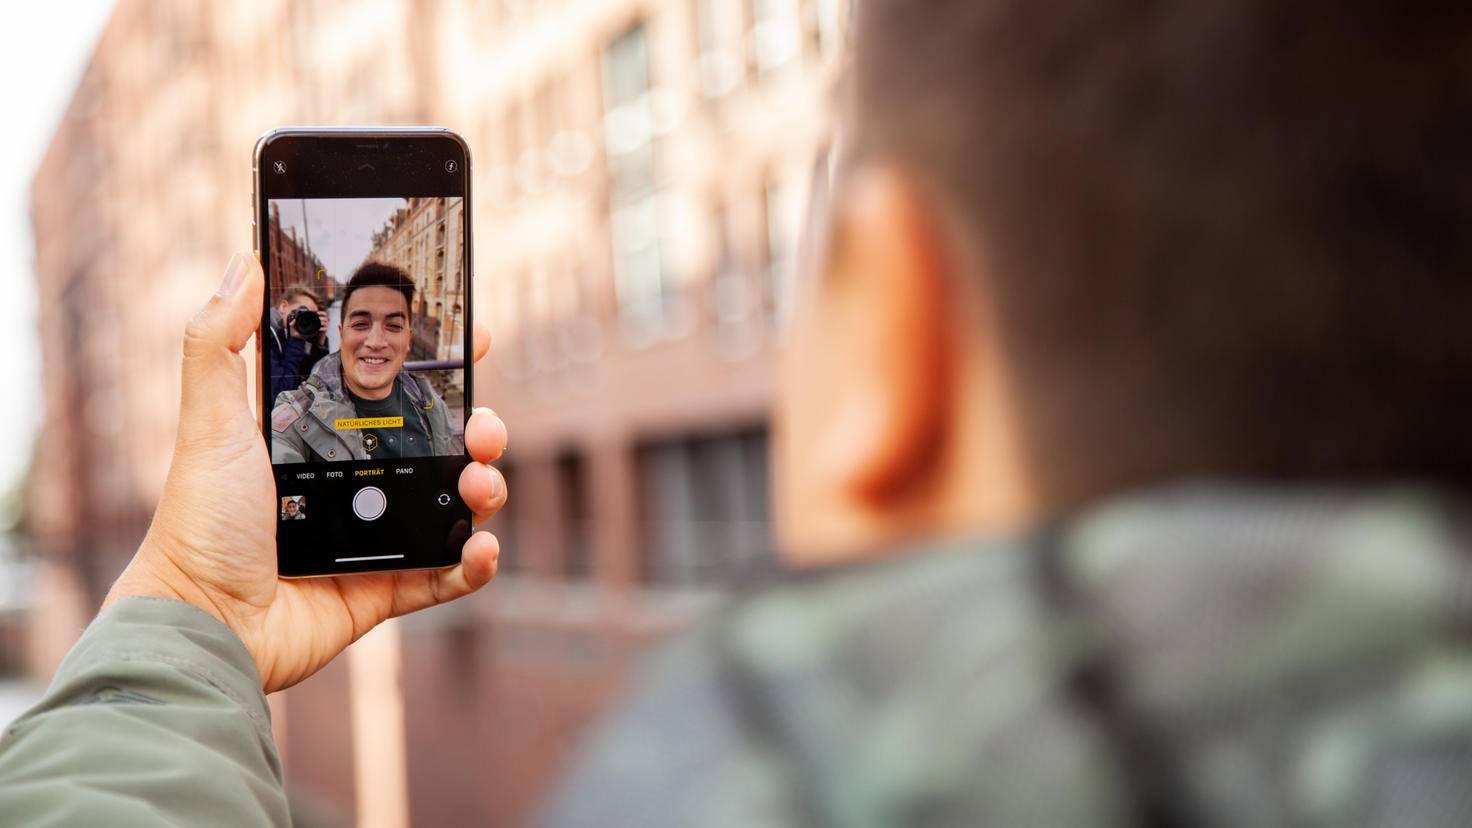 iphone-11-pro-max-selfie-foto